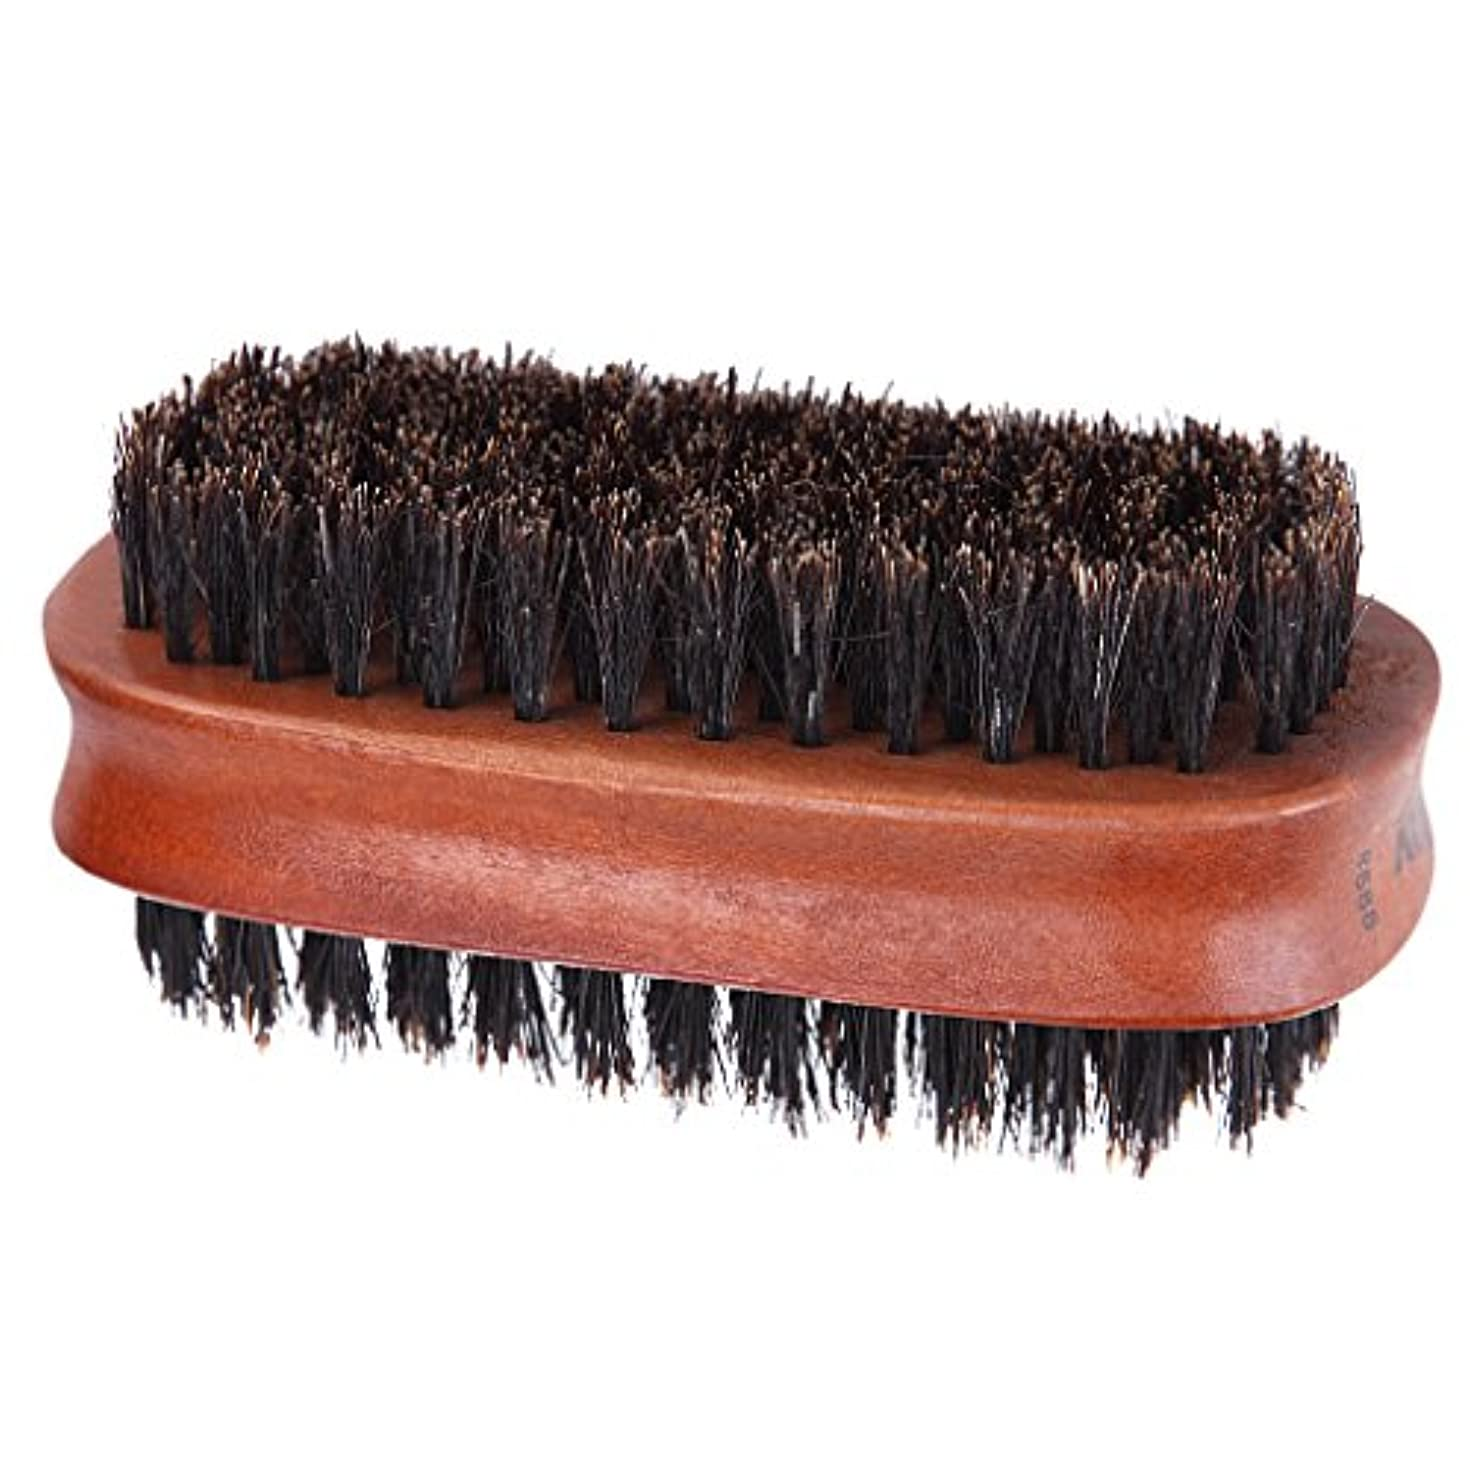 Kesoto ヘアブラシ 両面ブラシ 理髪店 美容院  ソフトブラシ ヘアカッター ダスターブラシ